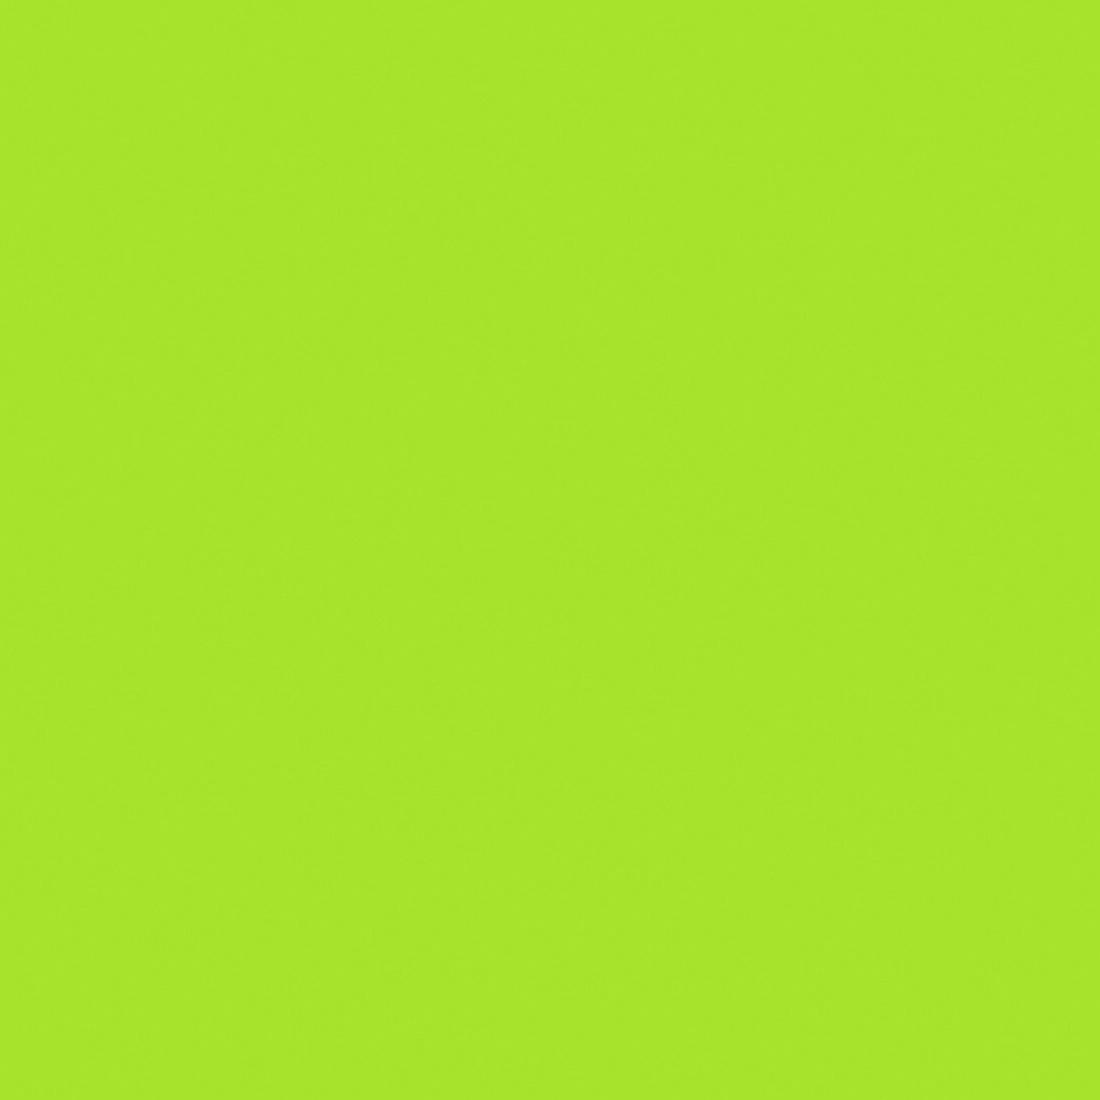 Dekor-LimoneDTrBNgvge3g6O